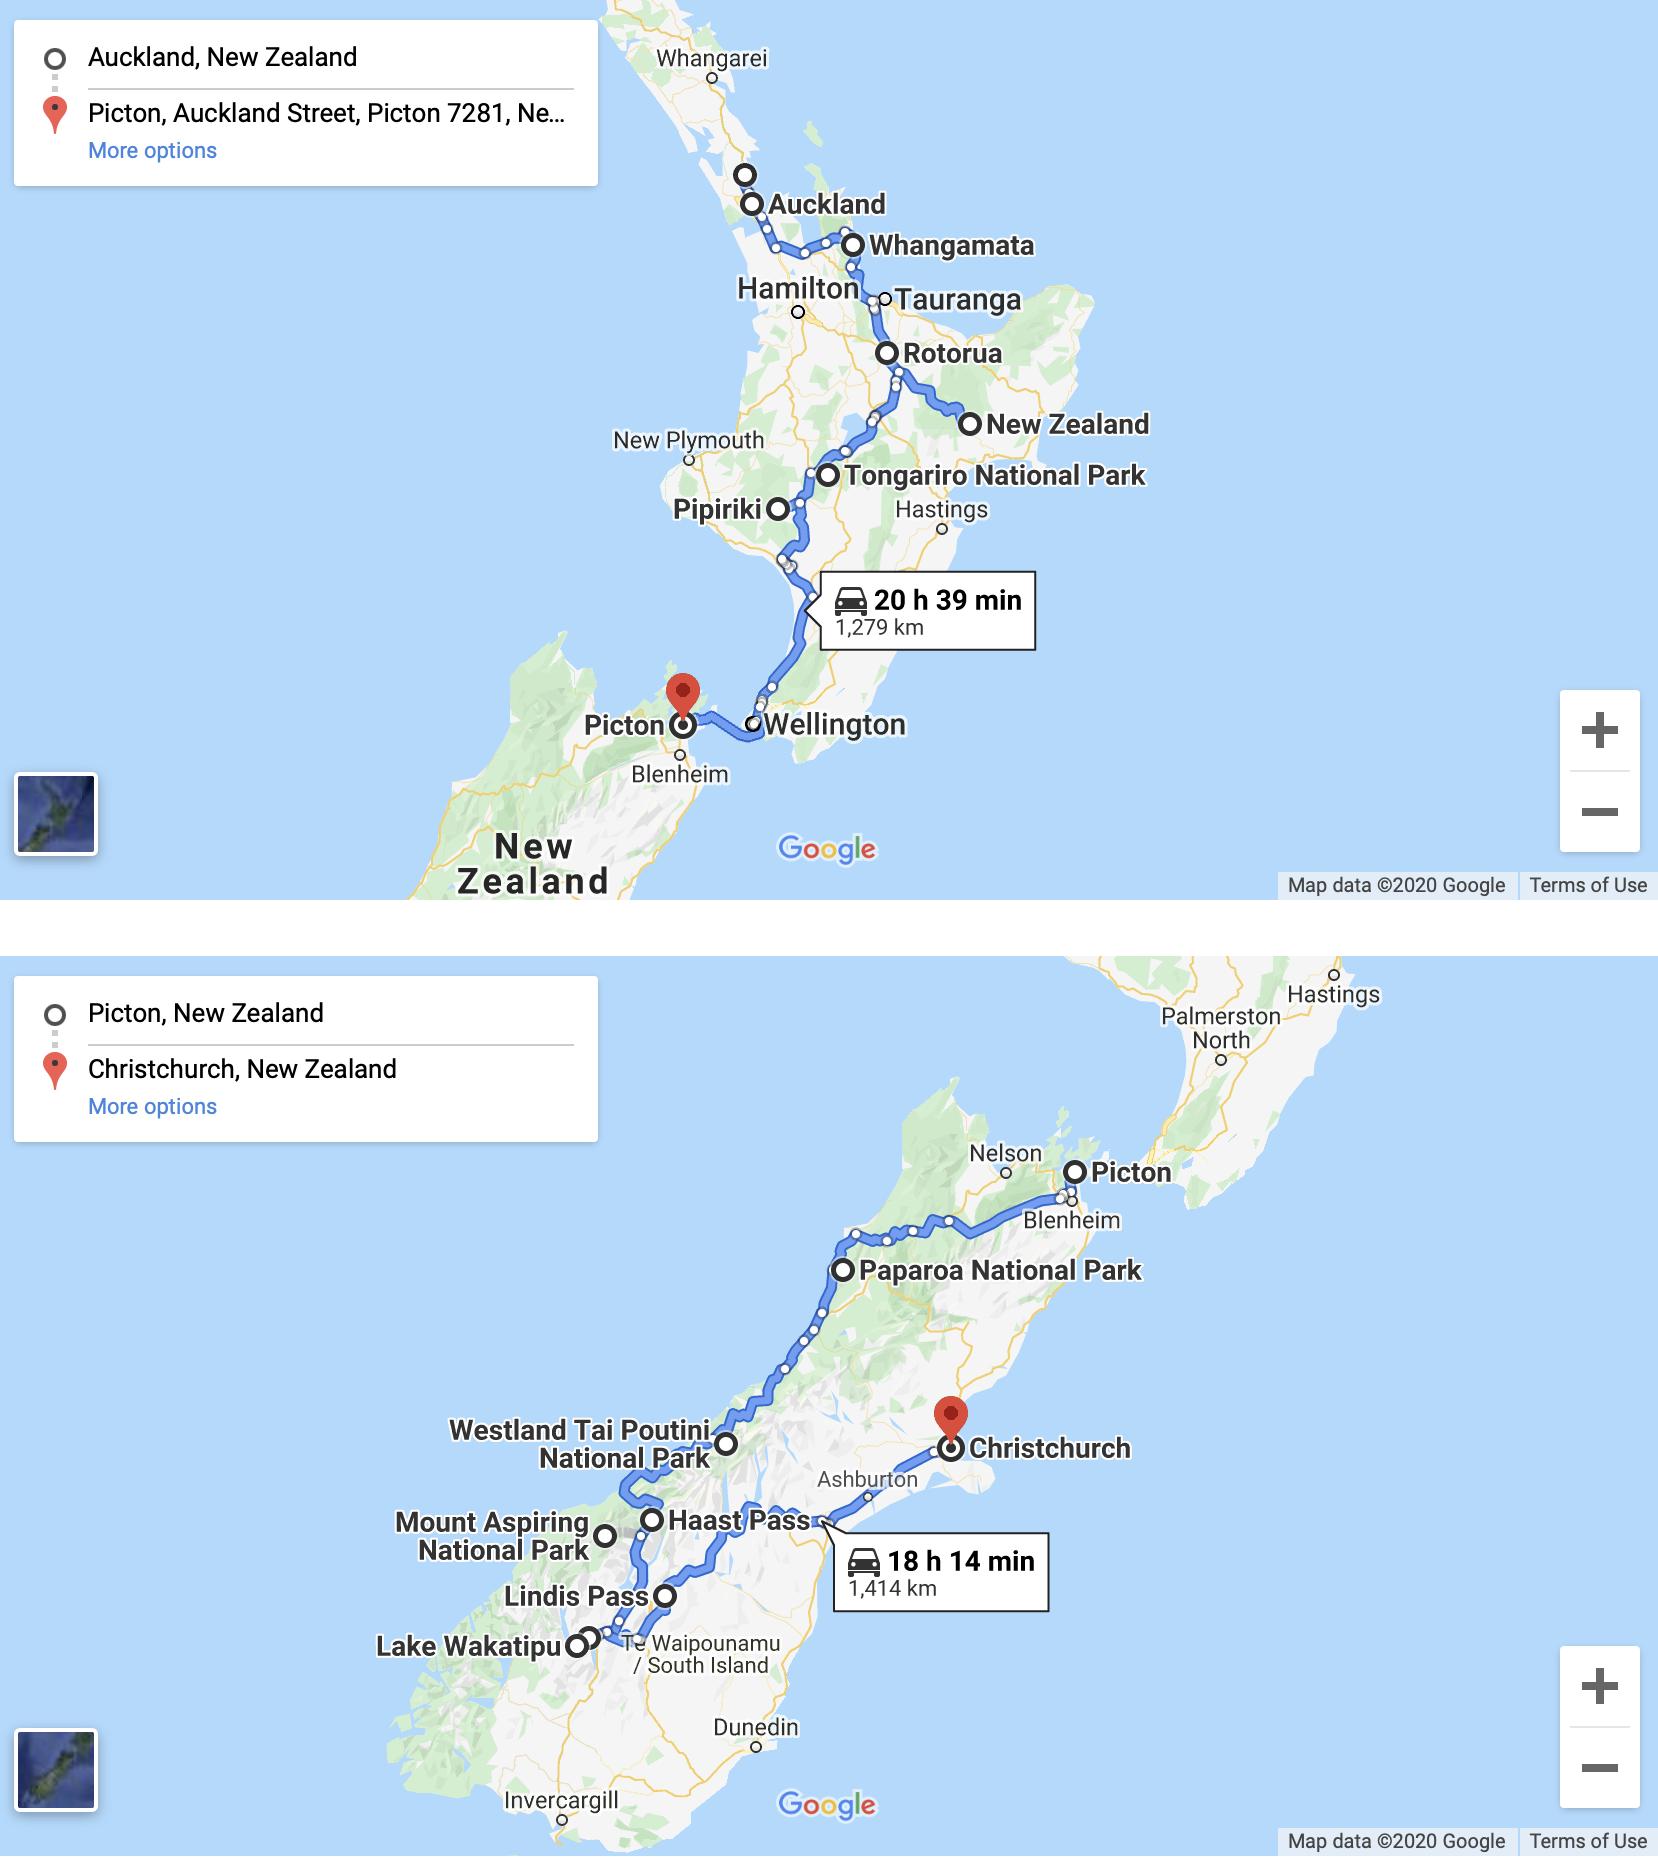 4 week Self-Drive New Zealand Road Trip Itinerary